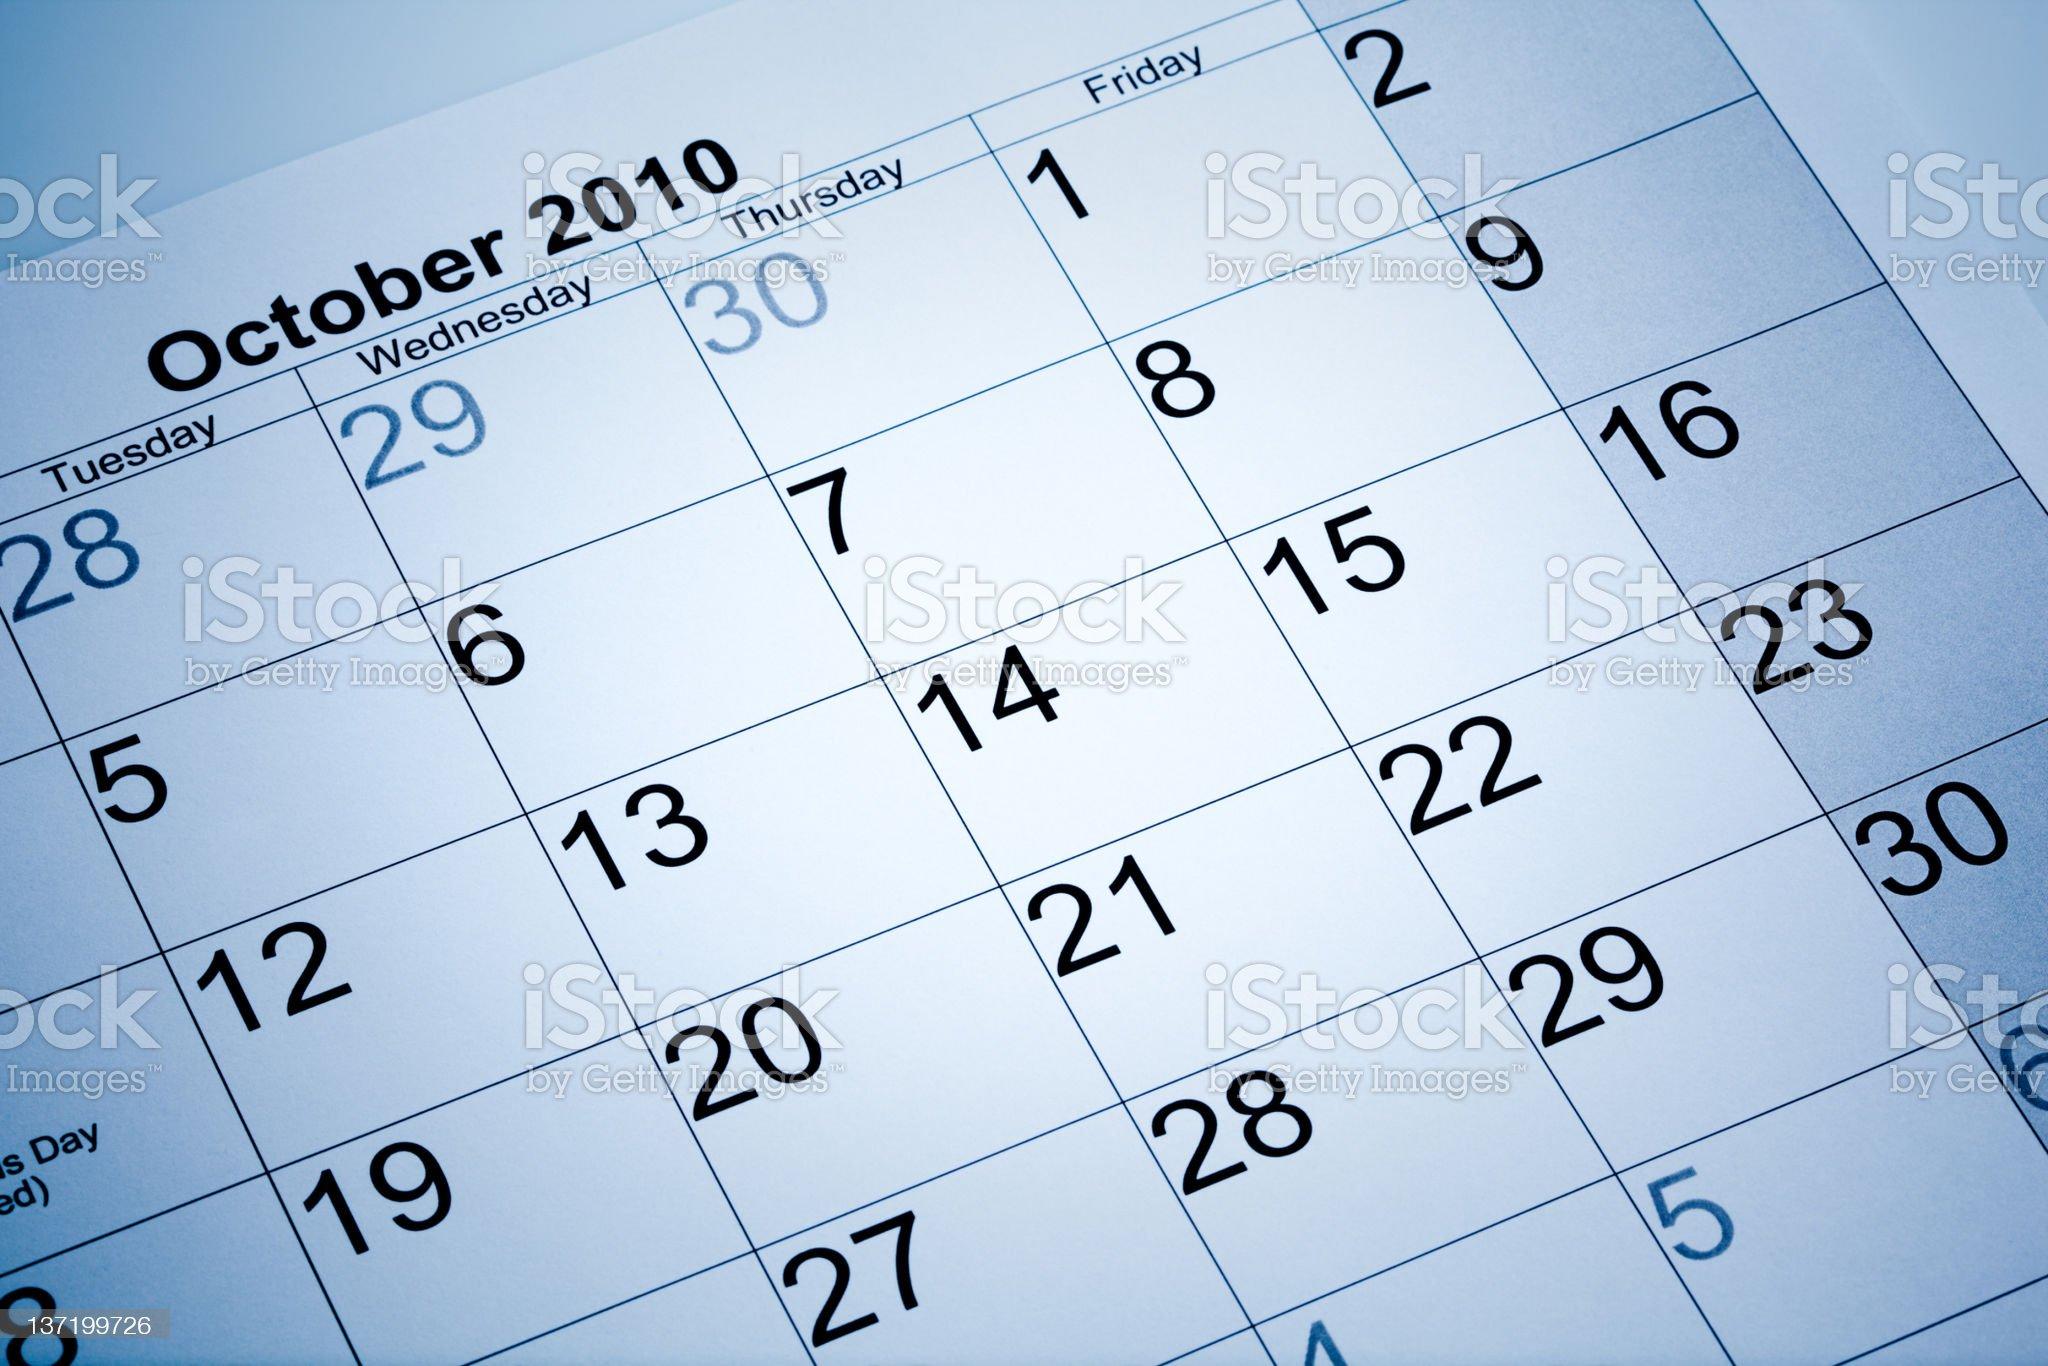 Actual calendar of October 2010 royalty-free stock photo